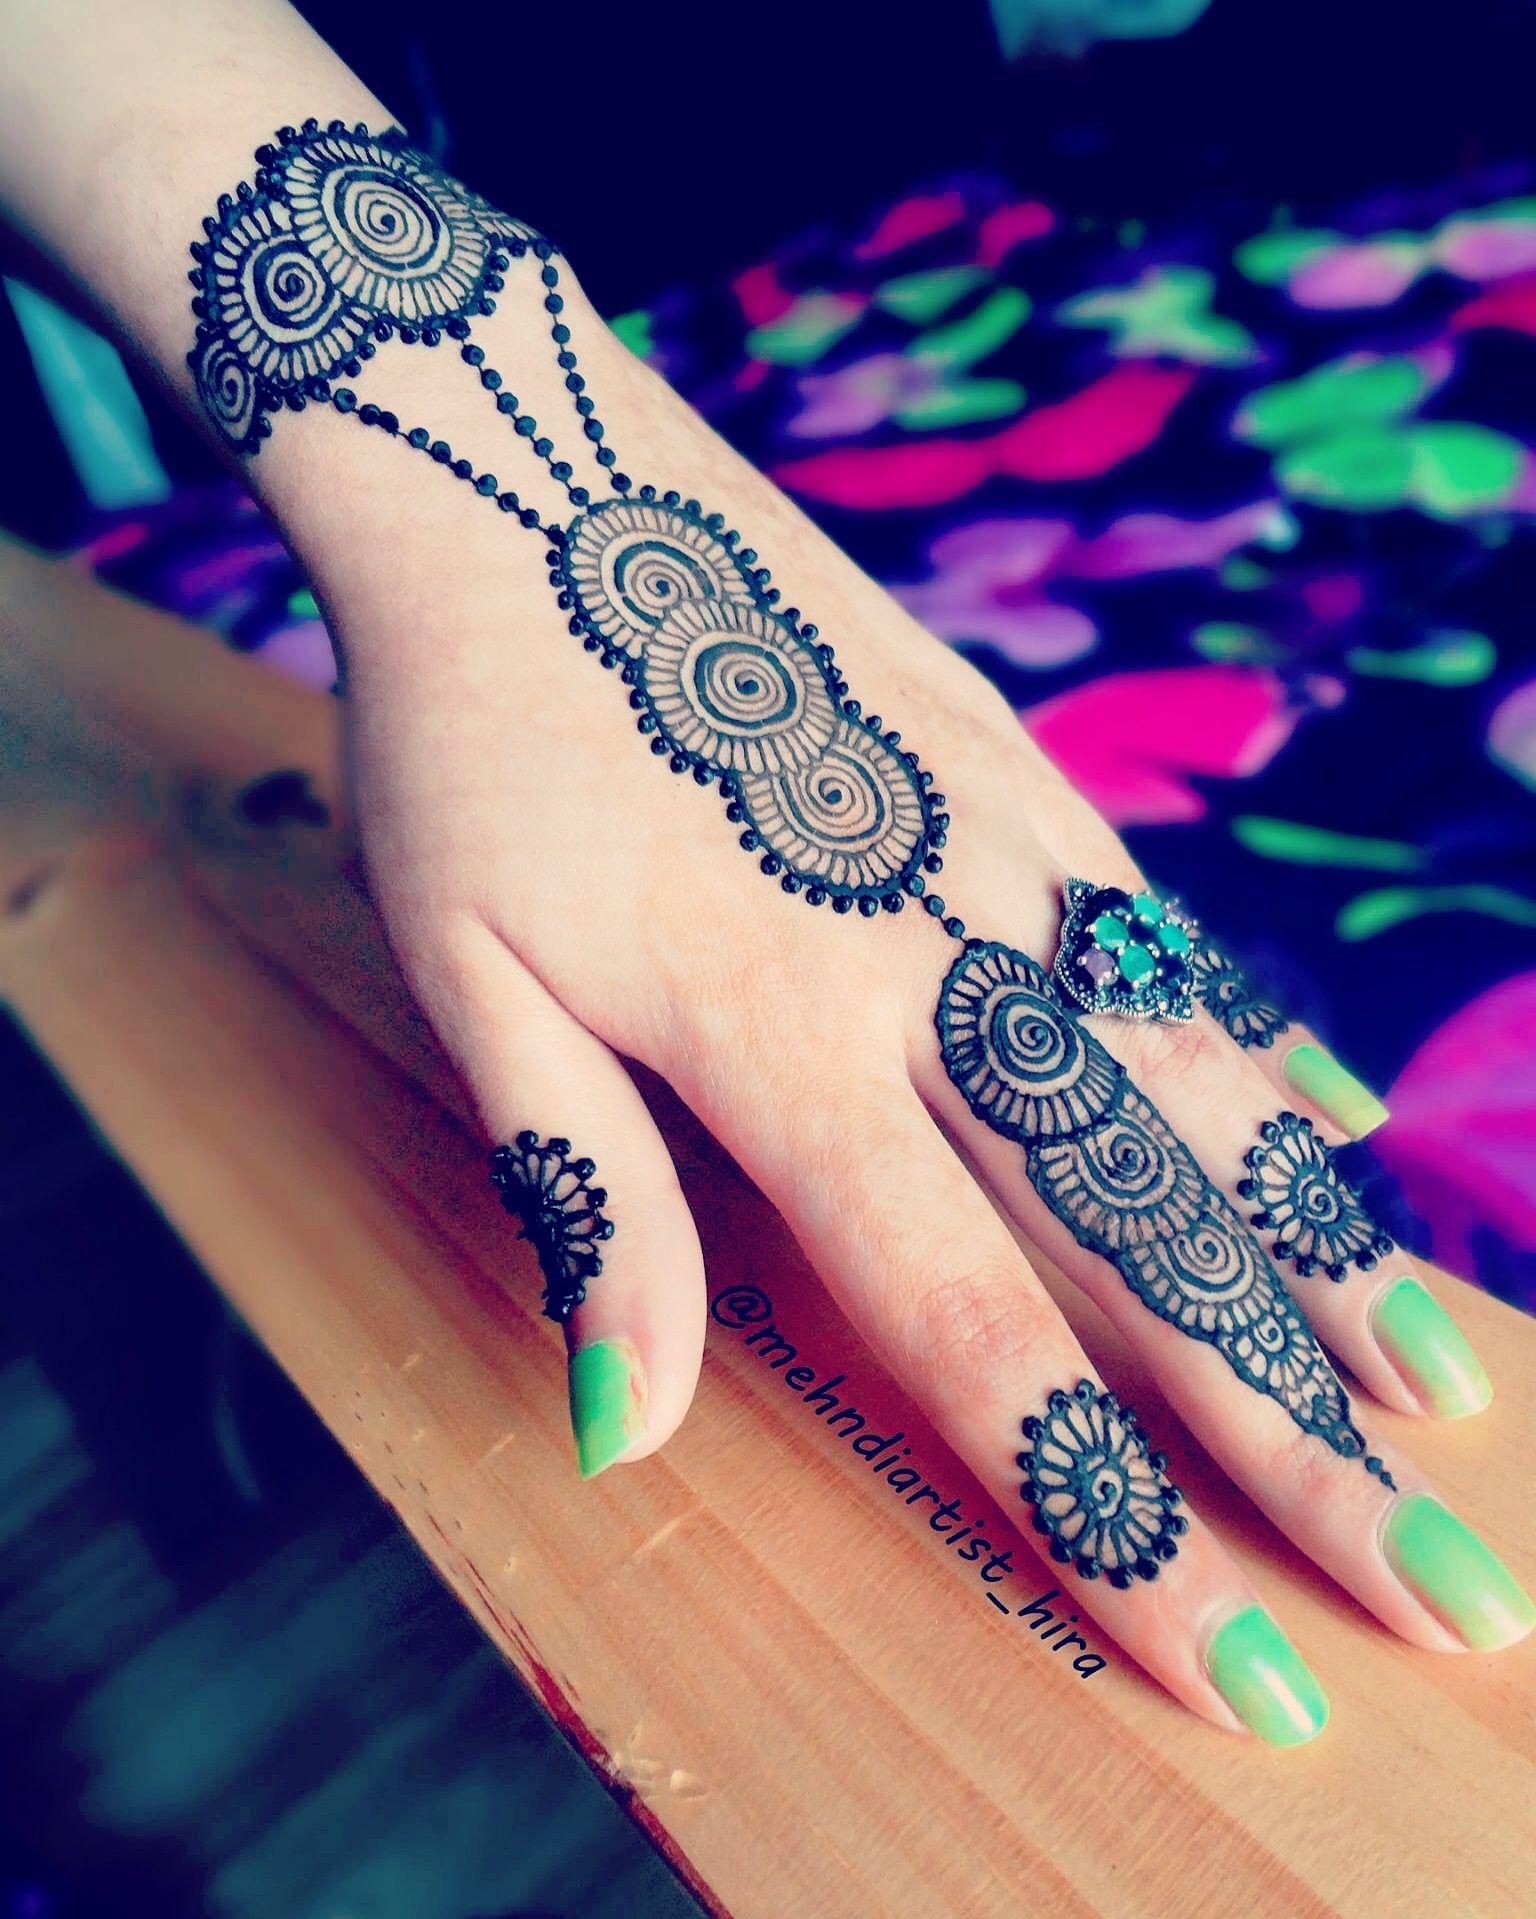 20 Beautful Henna Designs For Nikah: Mehndi Design Images, Henna Designs, Mehndi